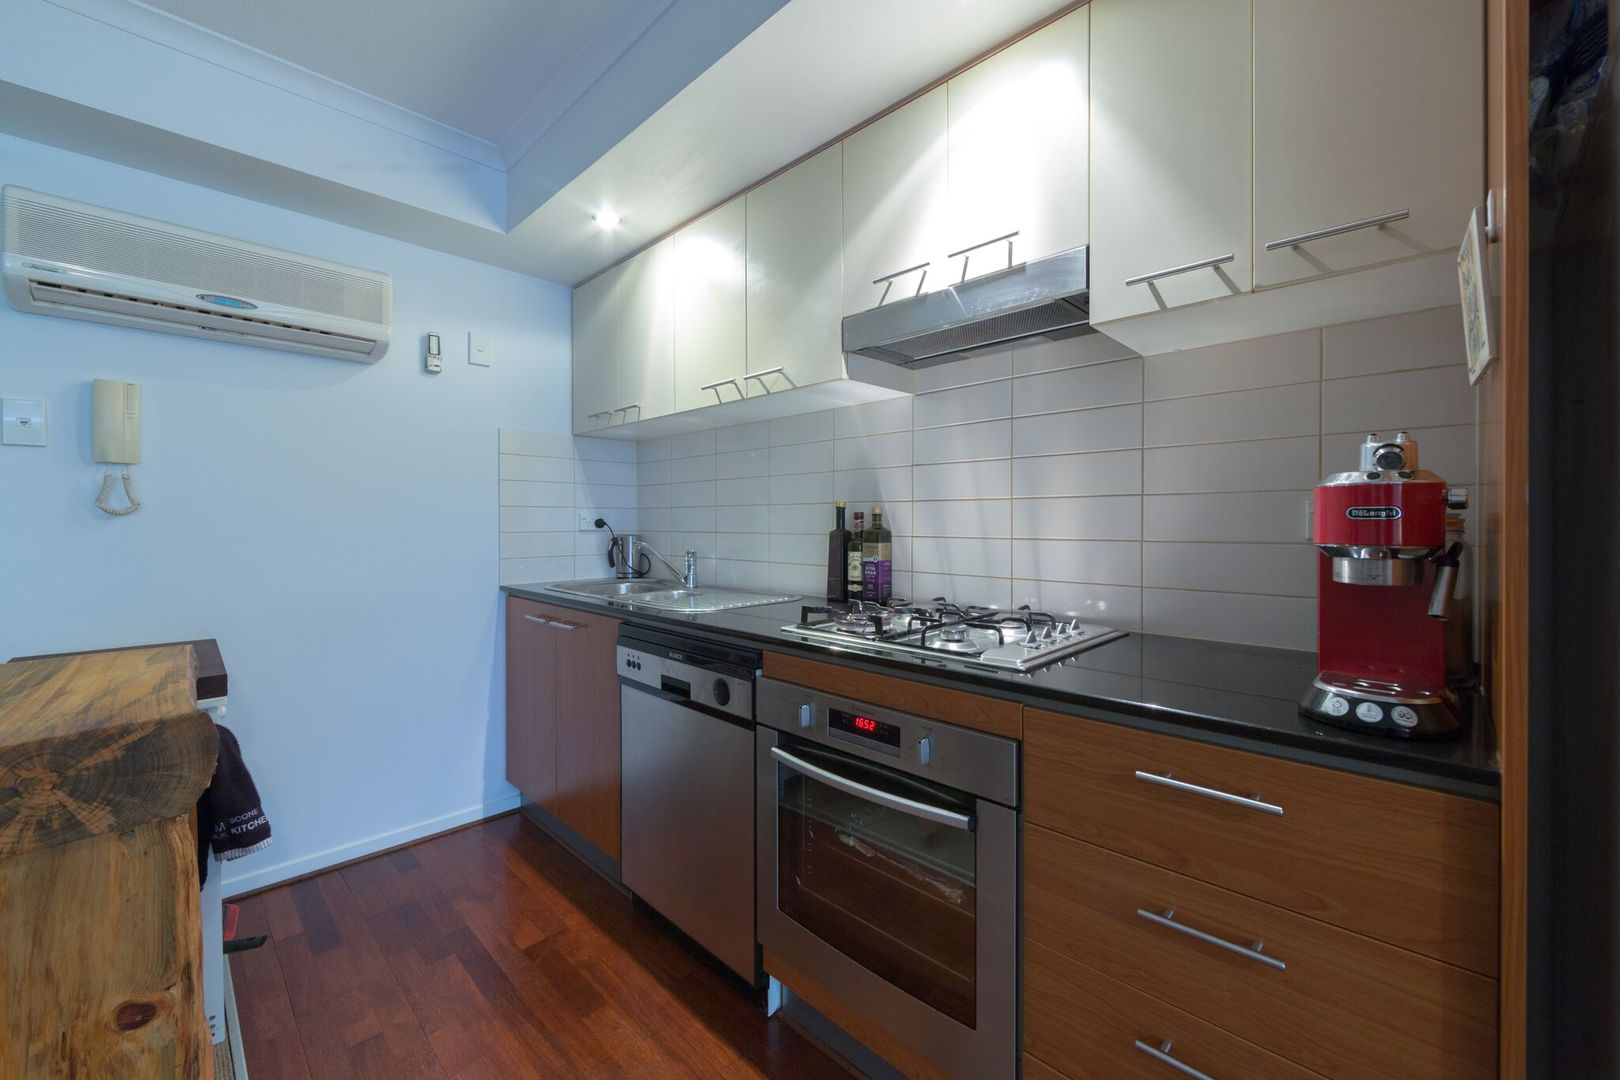 6-10 Manning St, South Brisbane QLD 4101, Image 1